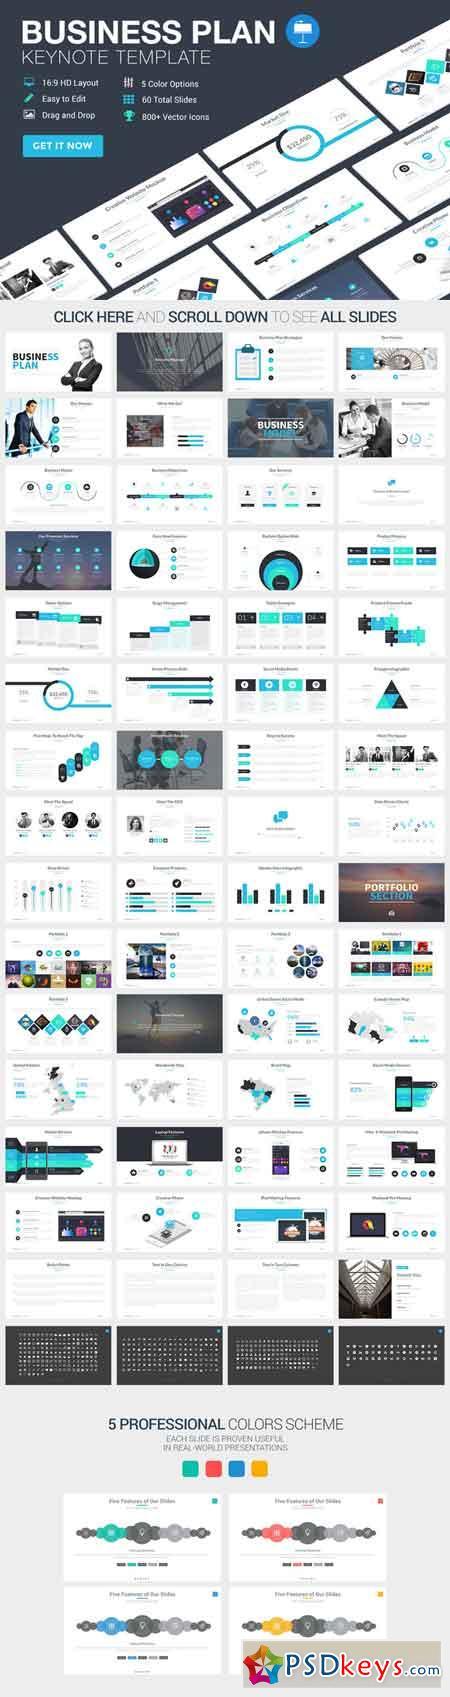 Business Plan Keynote Template 389434 Free Download Photoshop